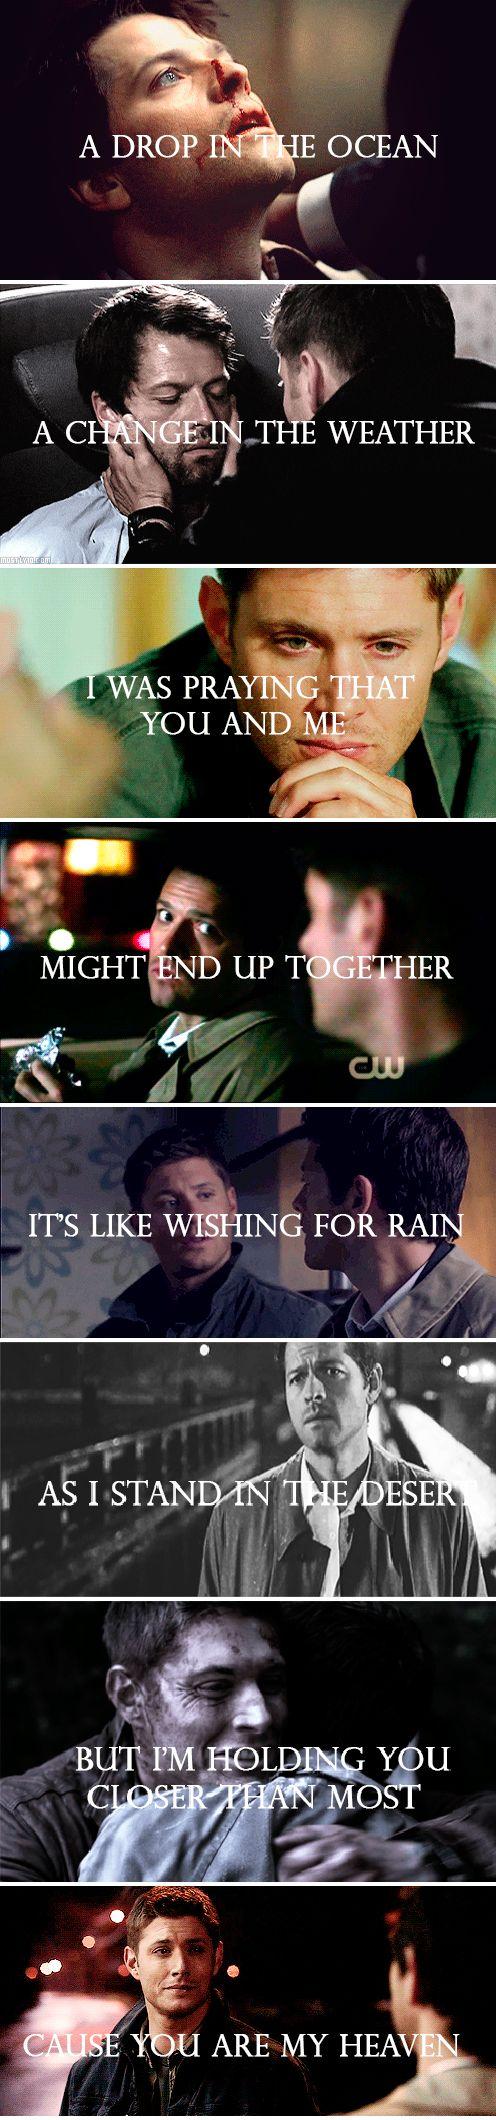 Dean + Castiel: I'm holding you closer than most. #spn #destiel